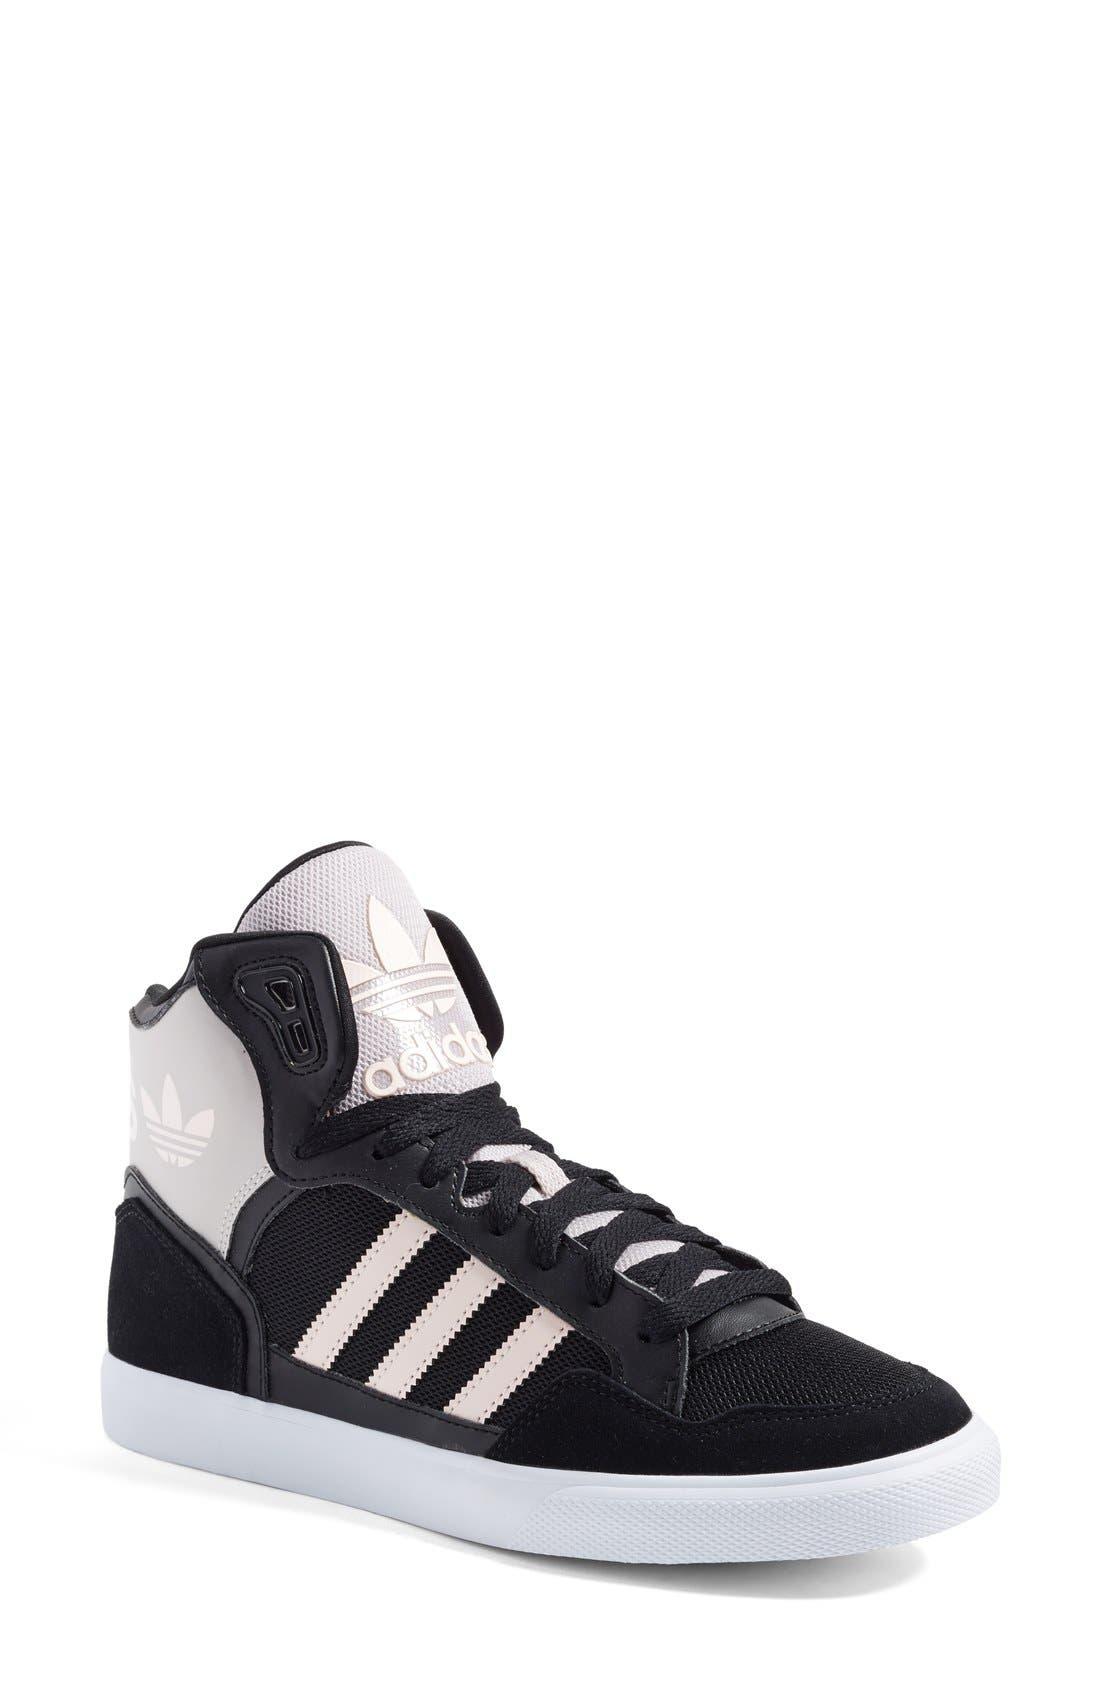 Alternate Image 1 Selected - adidas 'Extaball' High Top Sneaker (Women)